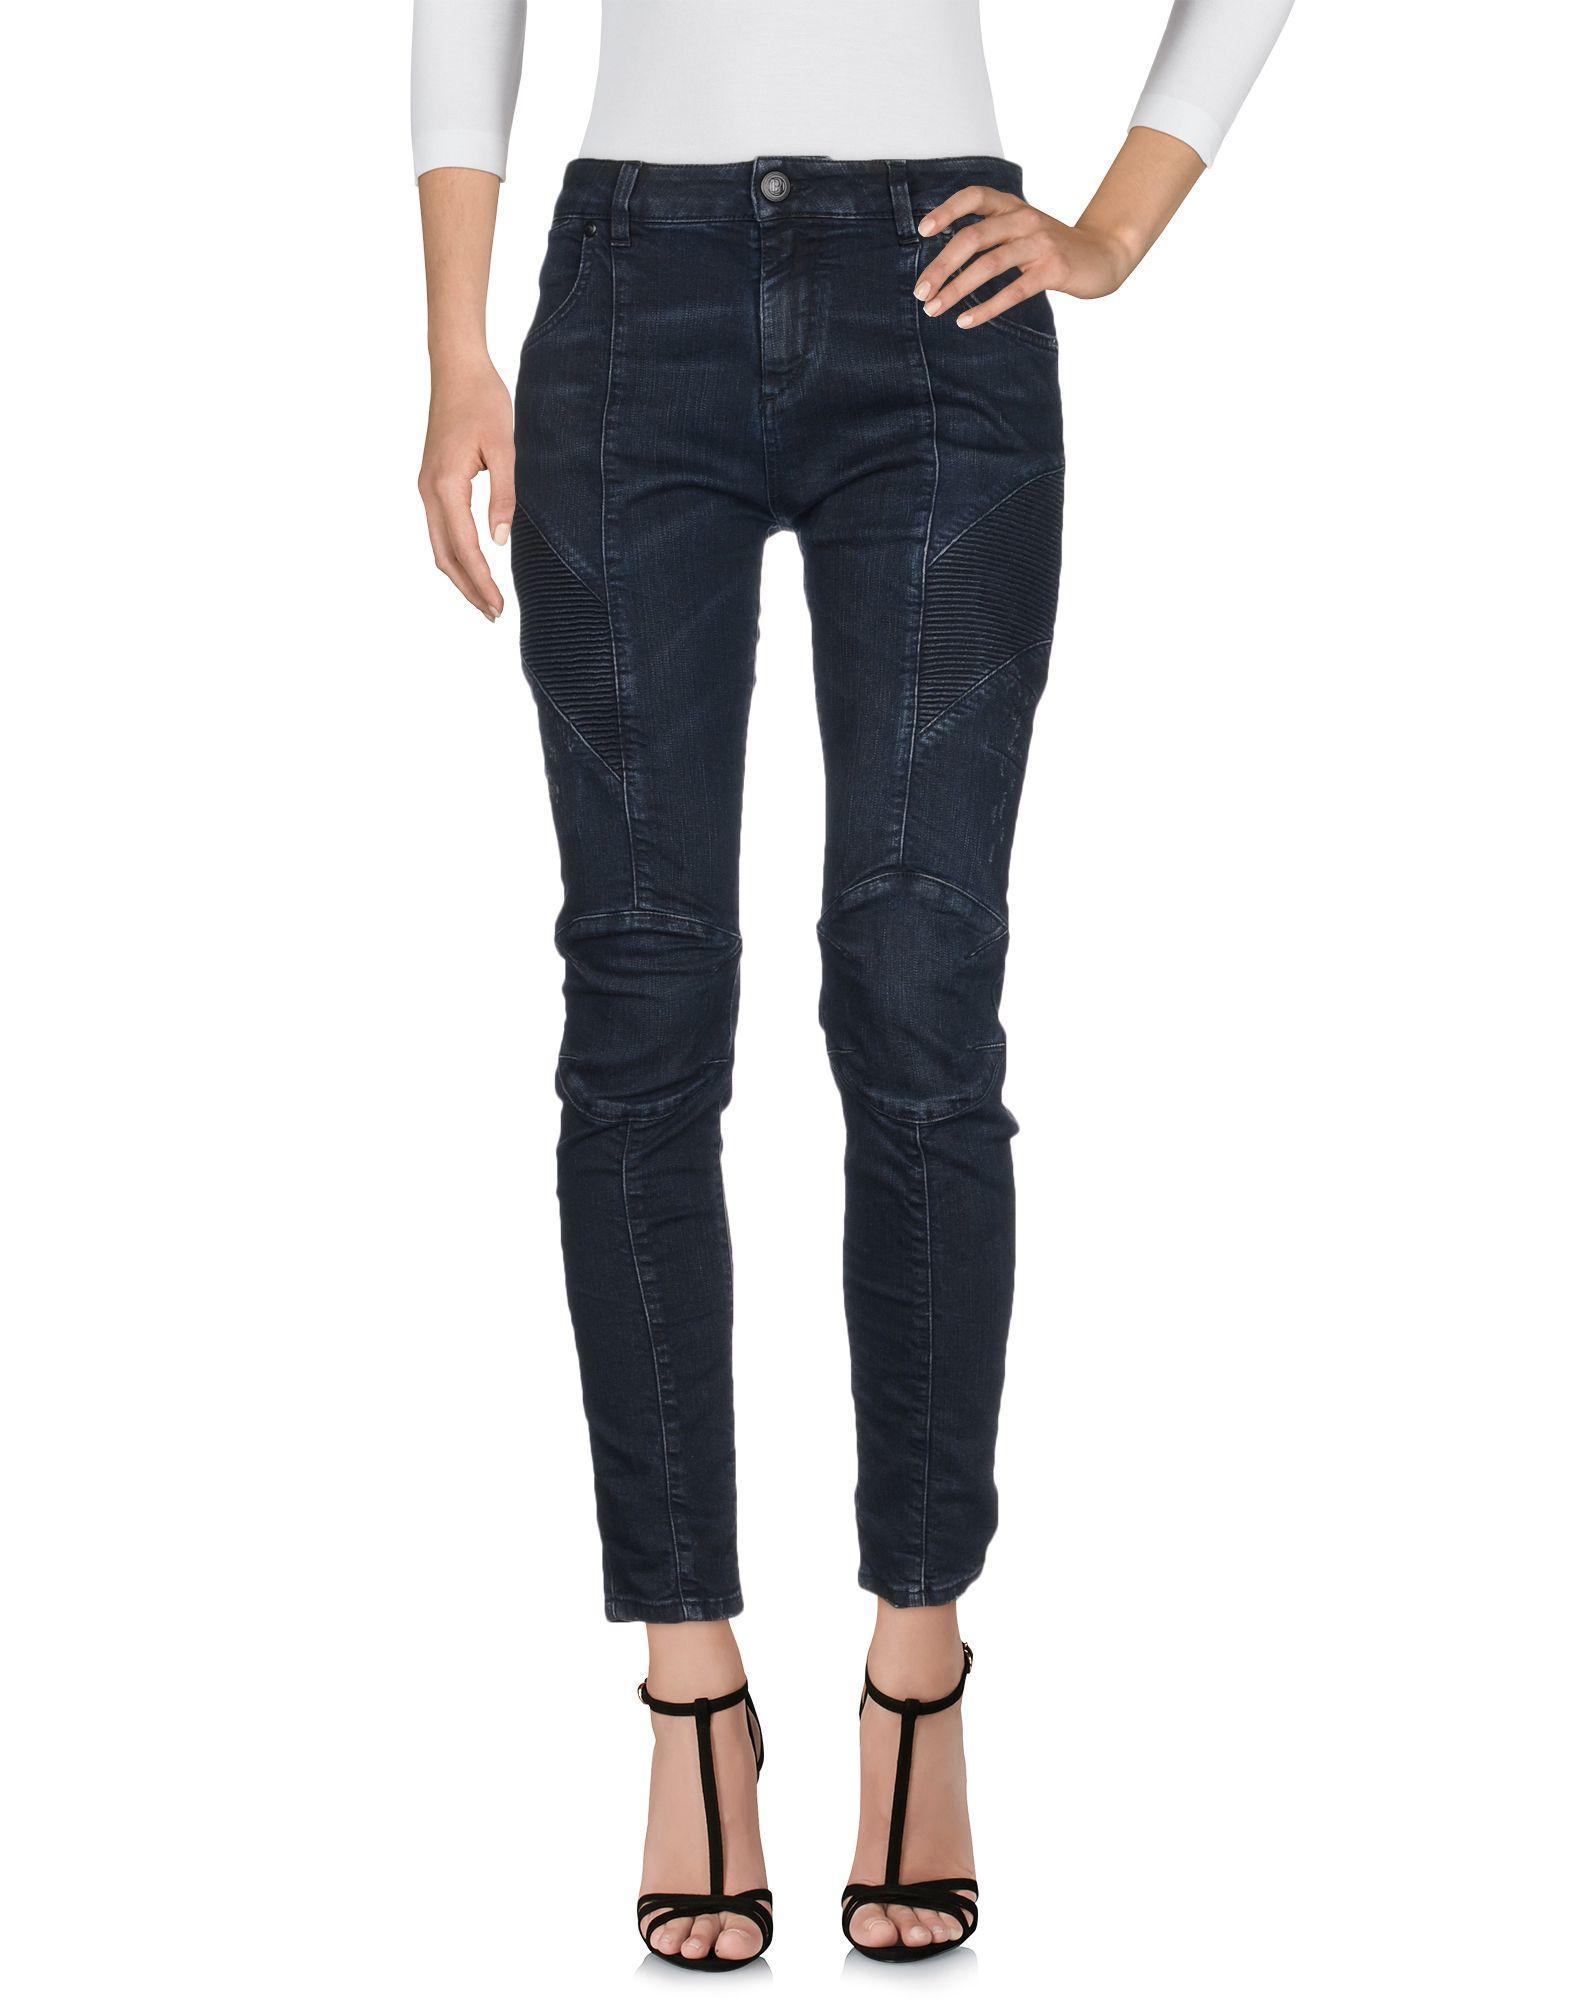 a04e9533 Pierre Balmain Jeans In Black | ModeSens